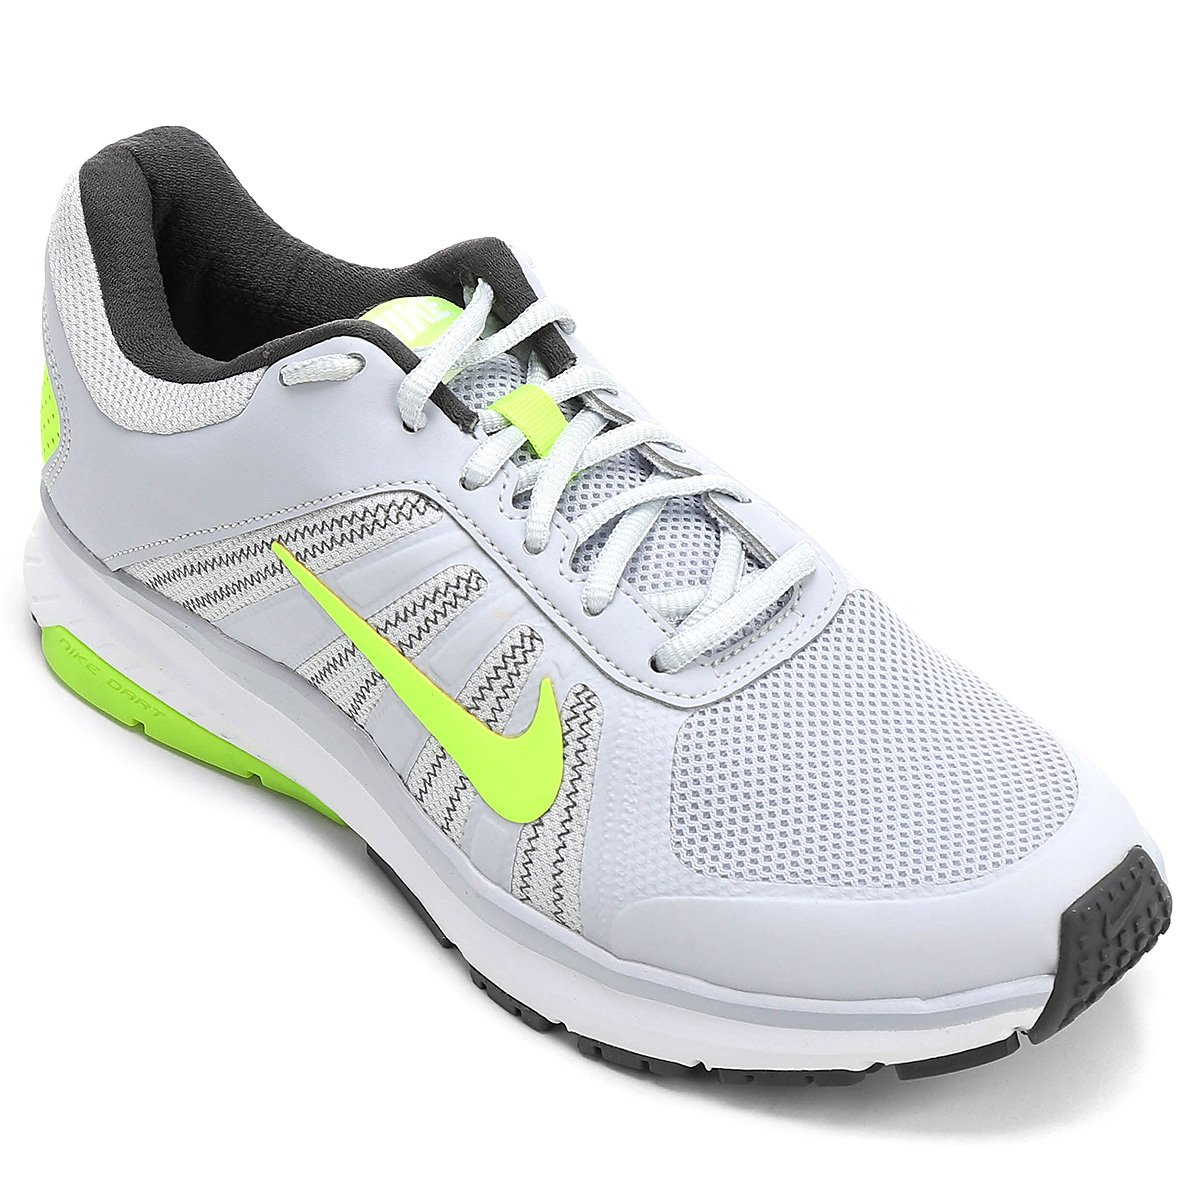 f6c096368542c Tênis Nike Dart 12 MSL Masculino - Branco e Verde - Compre Agora ...